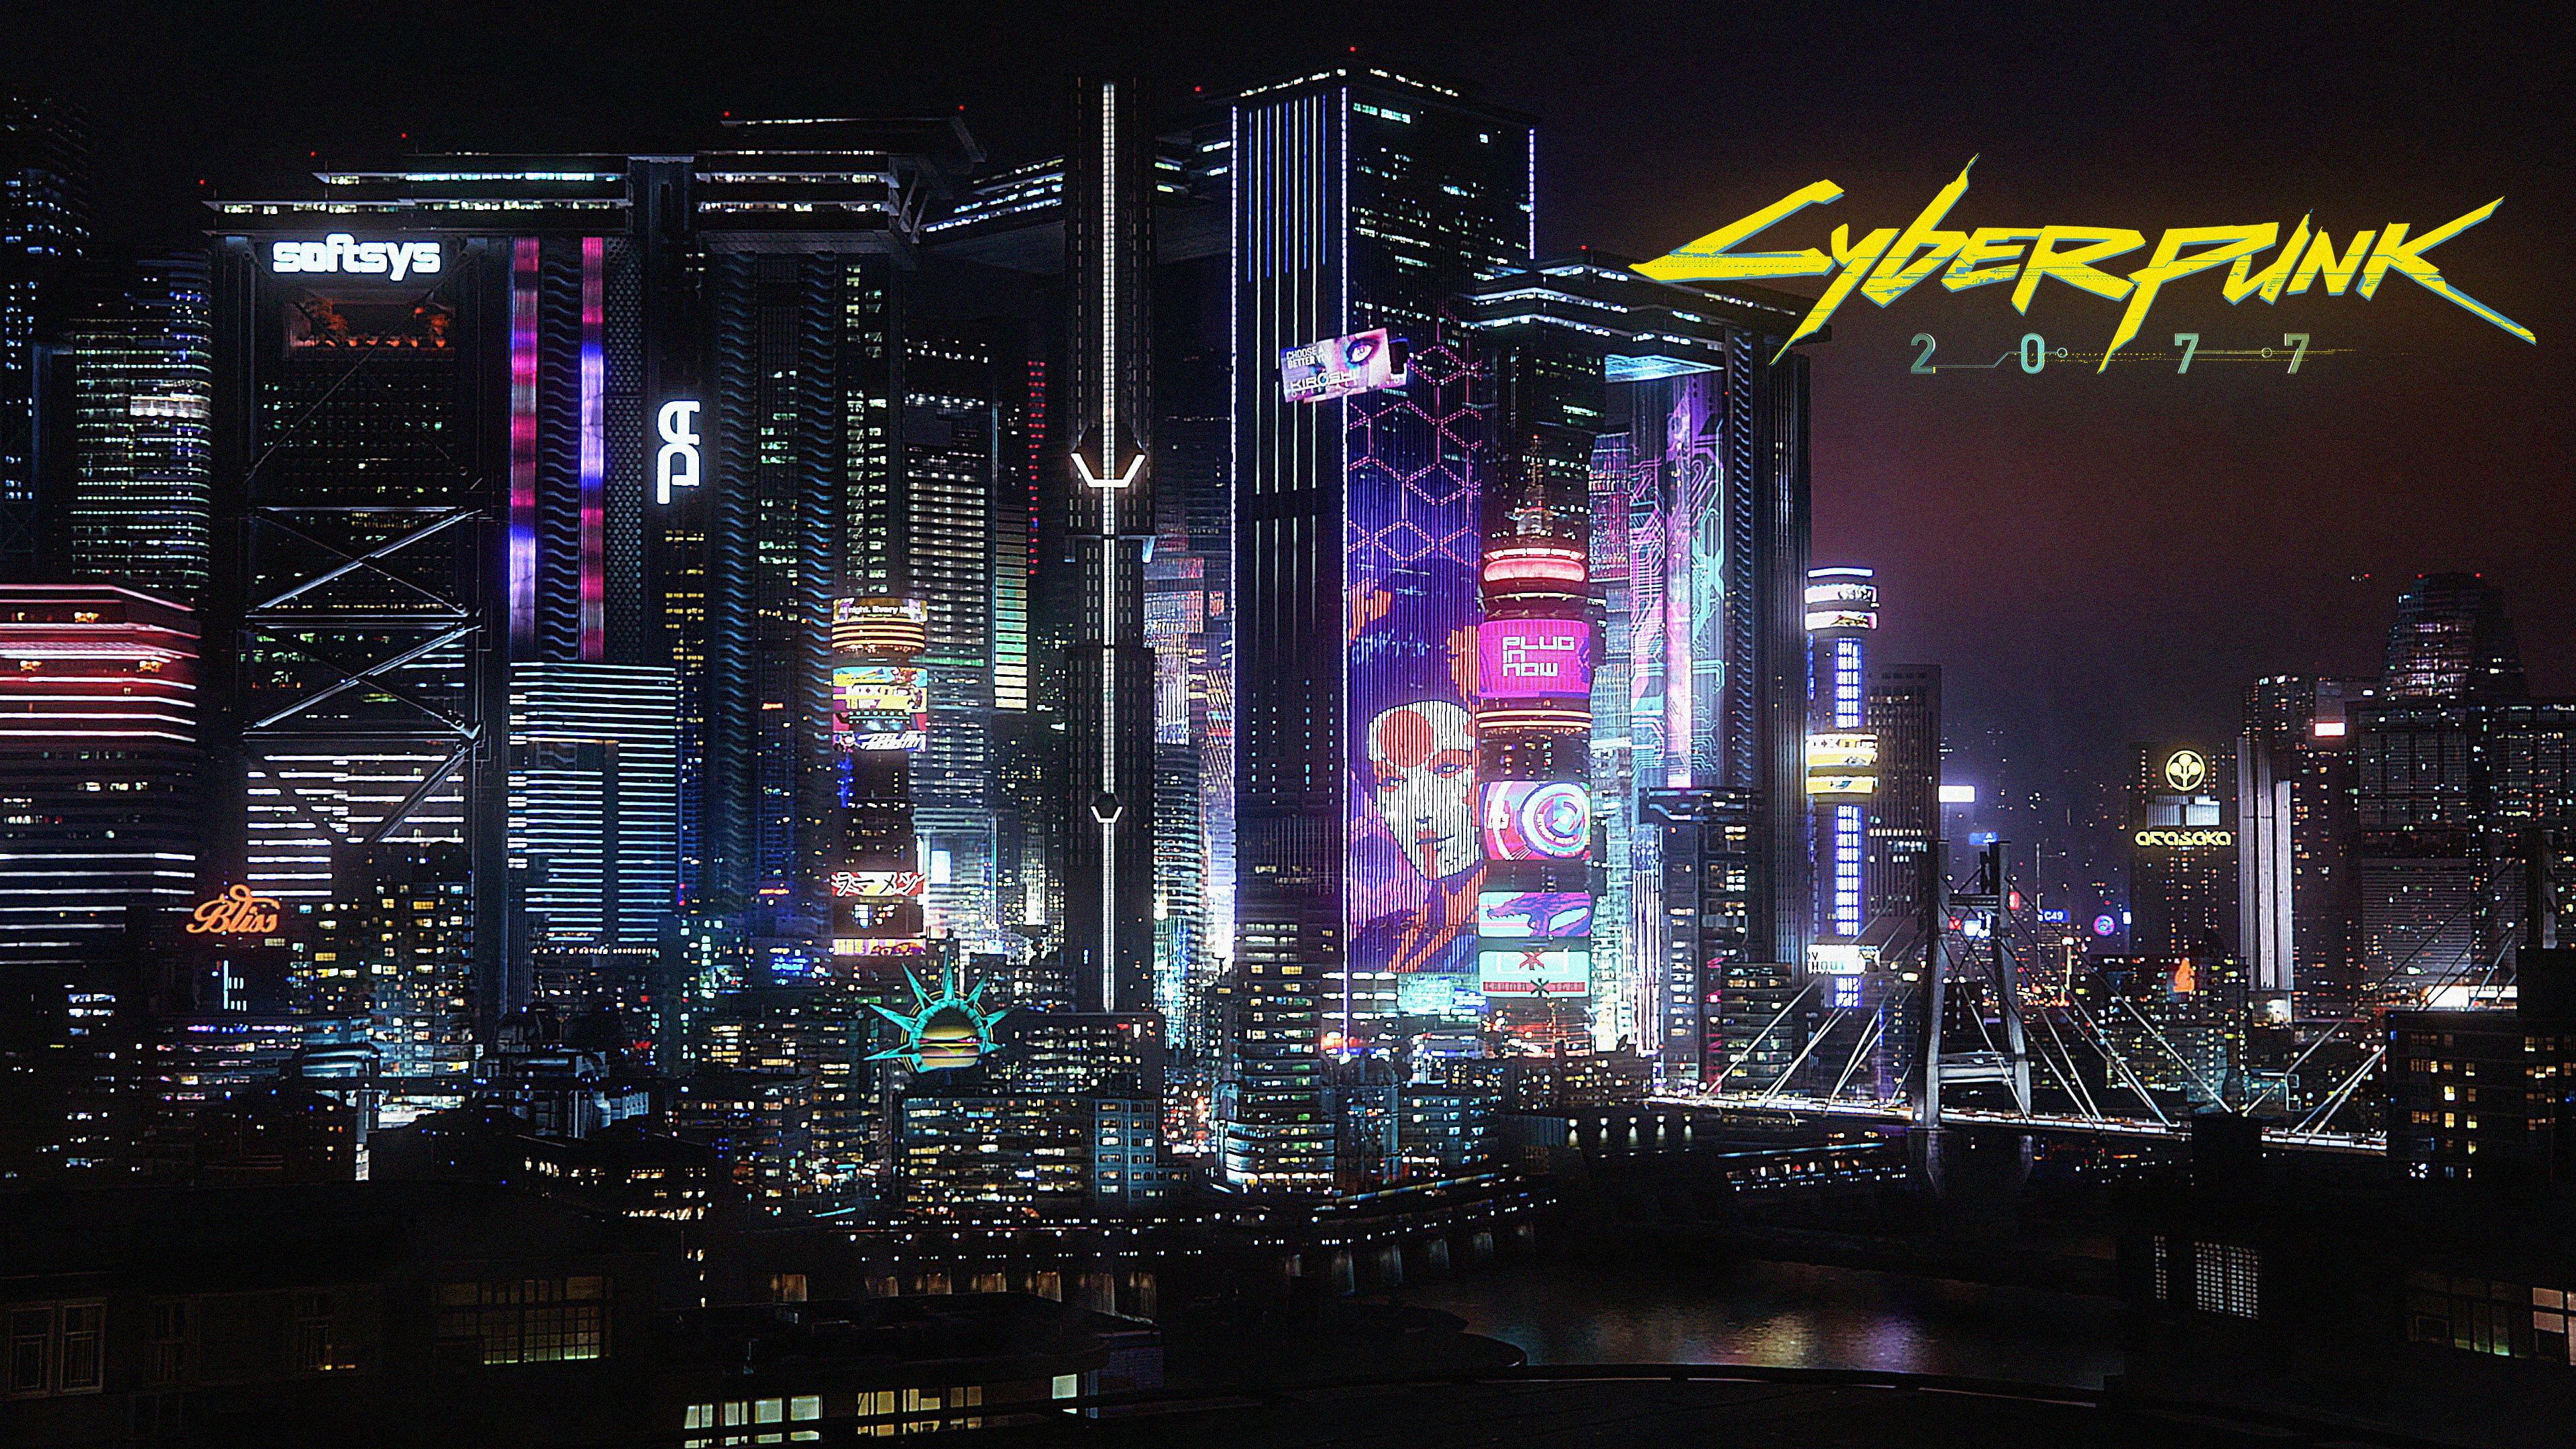 Cyberpunk 2077 Cyberpunk Video Game Art City Night City Lights Neon Glow Bridge 4k Wallpaper In 2021 Cyberpunk 2077 Wallpaper Neon Glow Wallpaper Glow Wallpaper